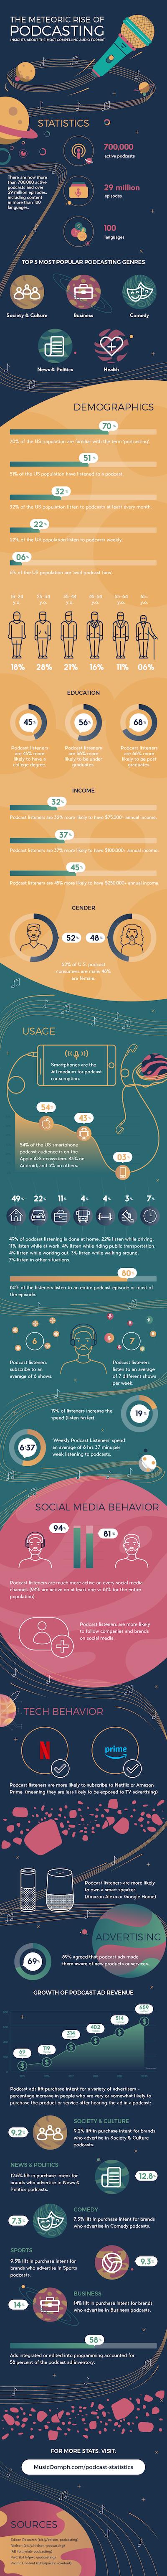 Podcast-Statistics.png